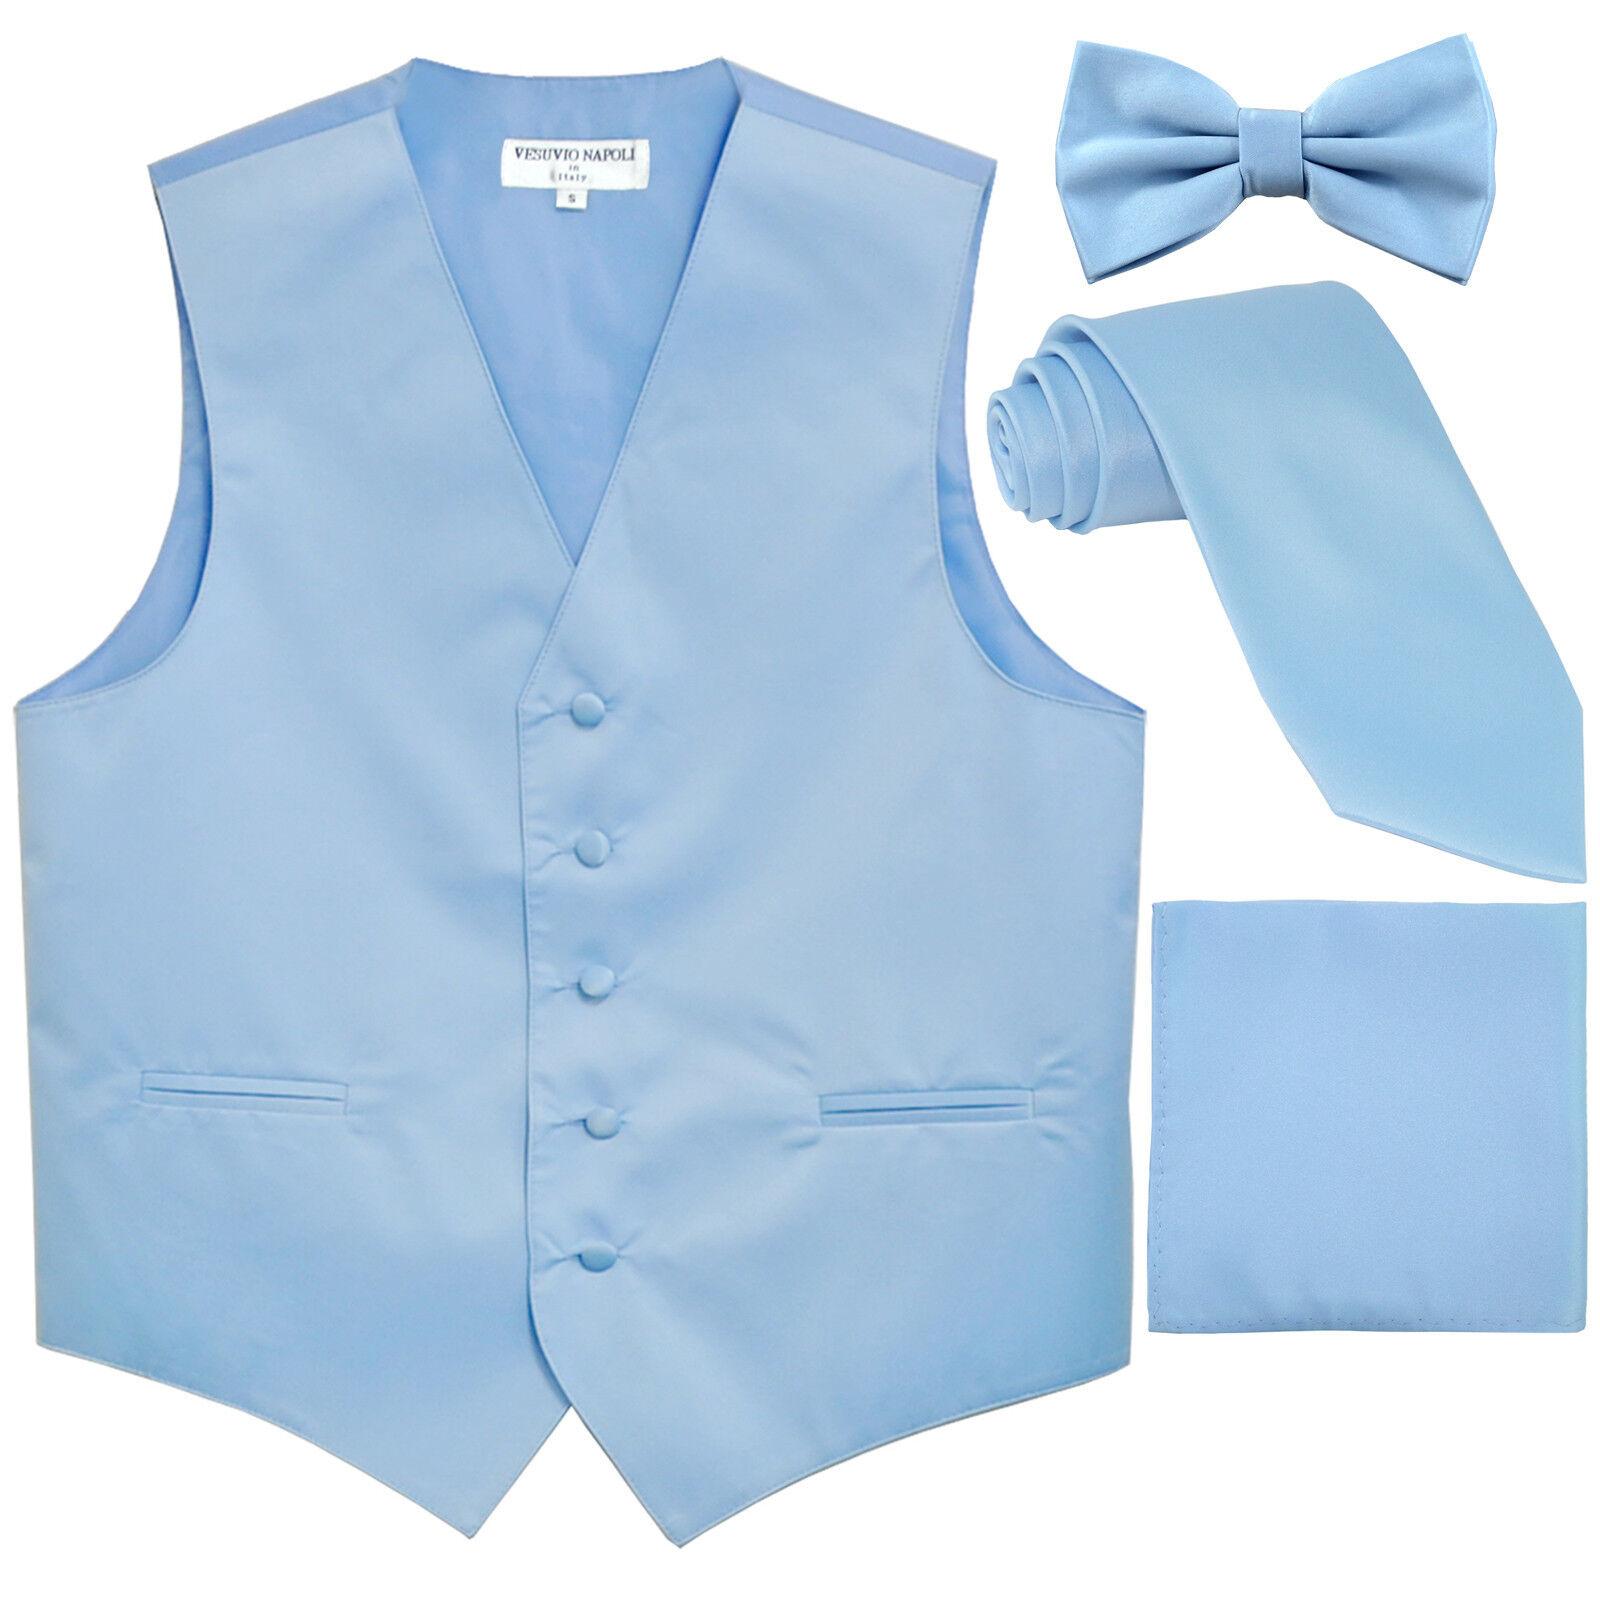 New Men's tuxedo Vest Waistcoat_Necktie, Bowtie & Hankie Set Light Blue formal